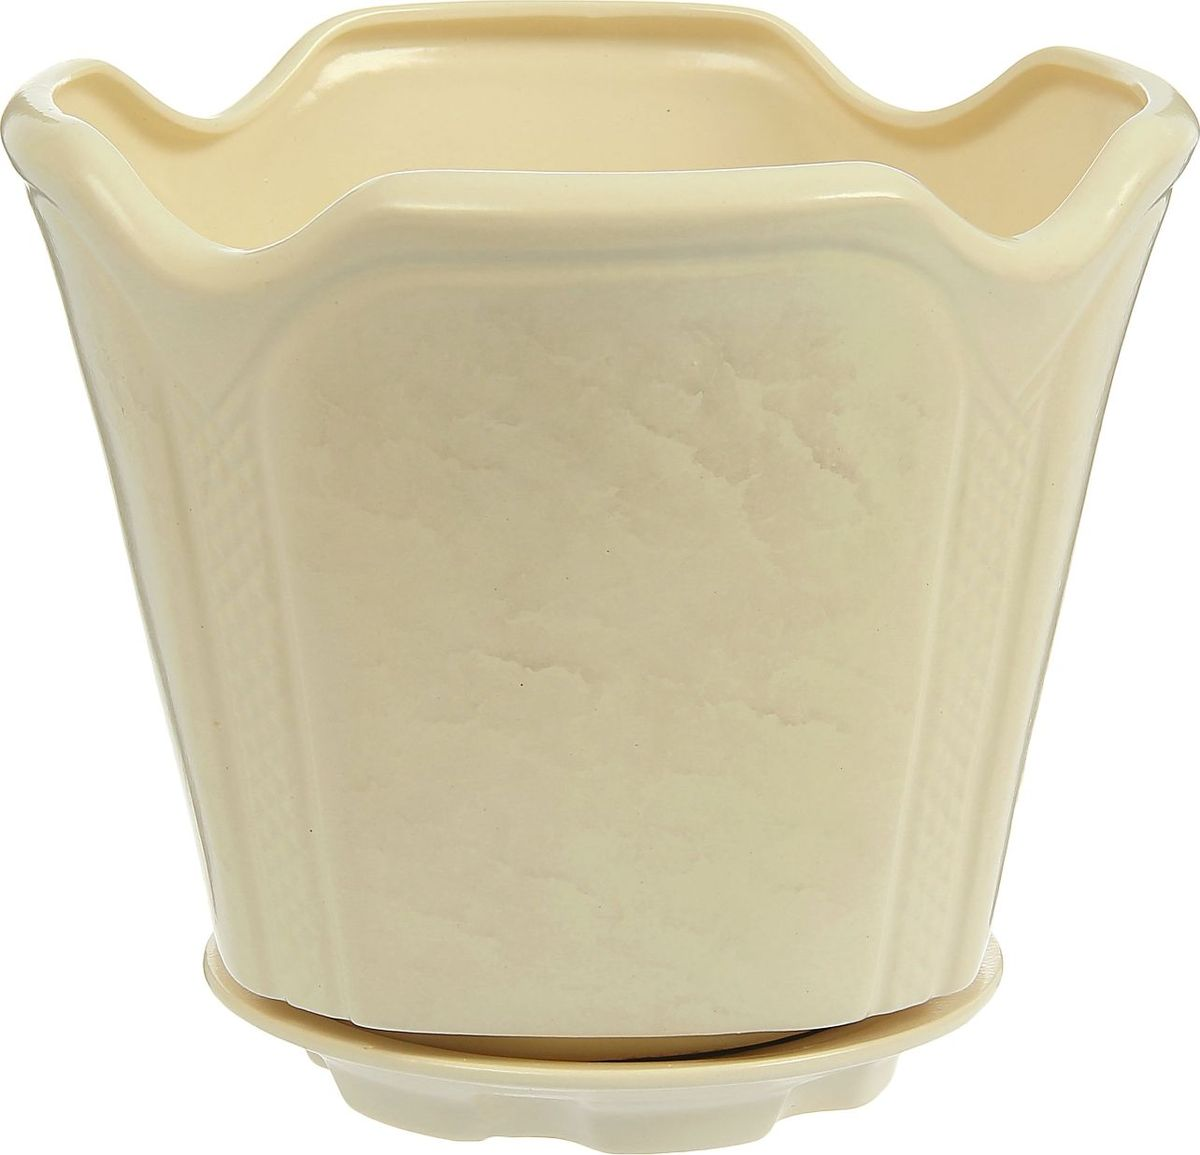 Кашпо Готика, цвет: белый, 7,1 л1239151